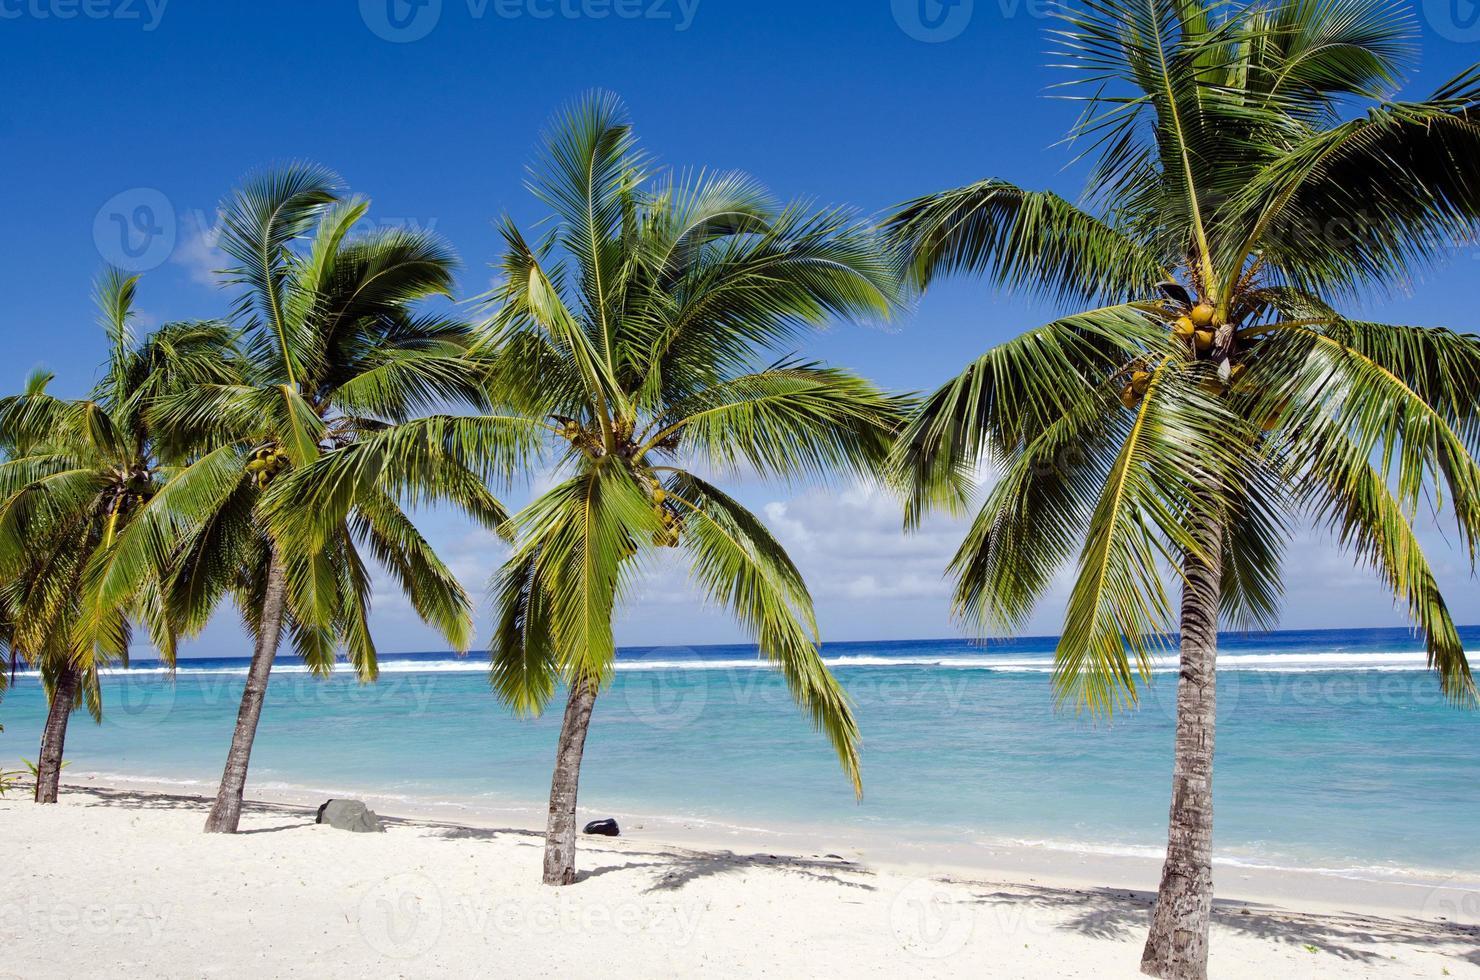 Plage Titikaveka dans les îles Cook de Rarotonga photo